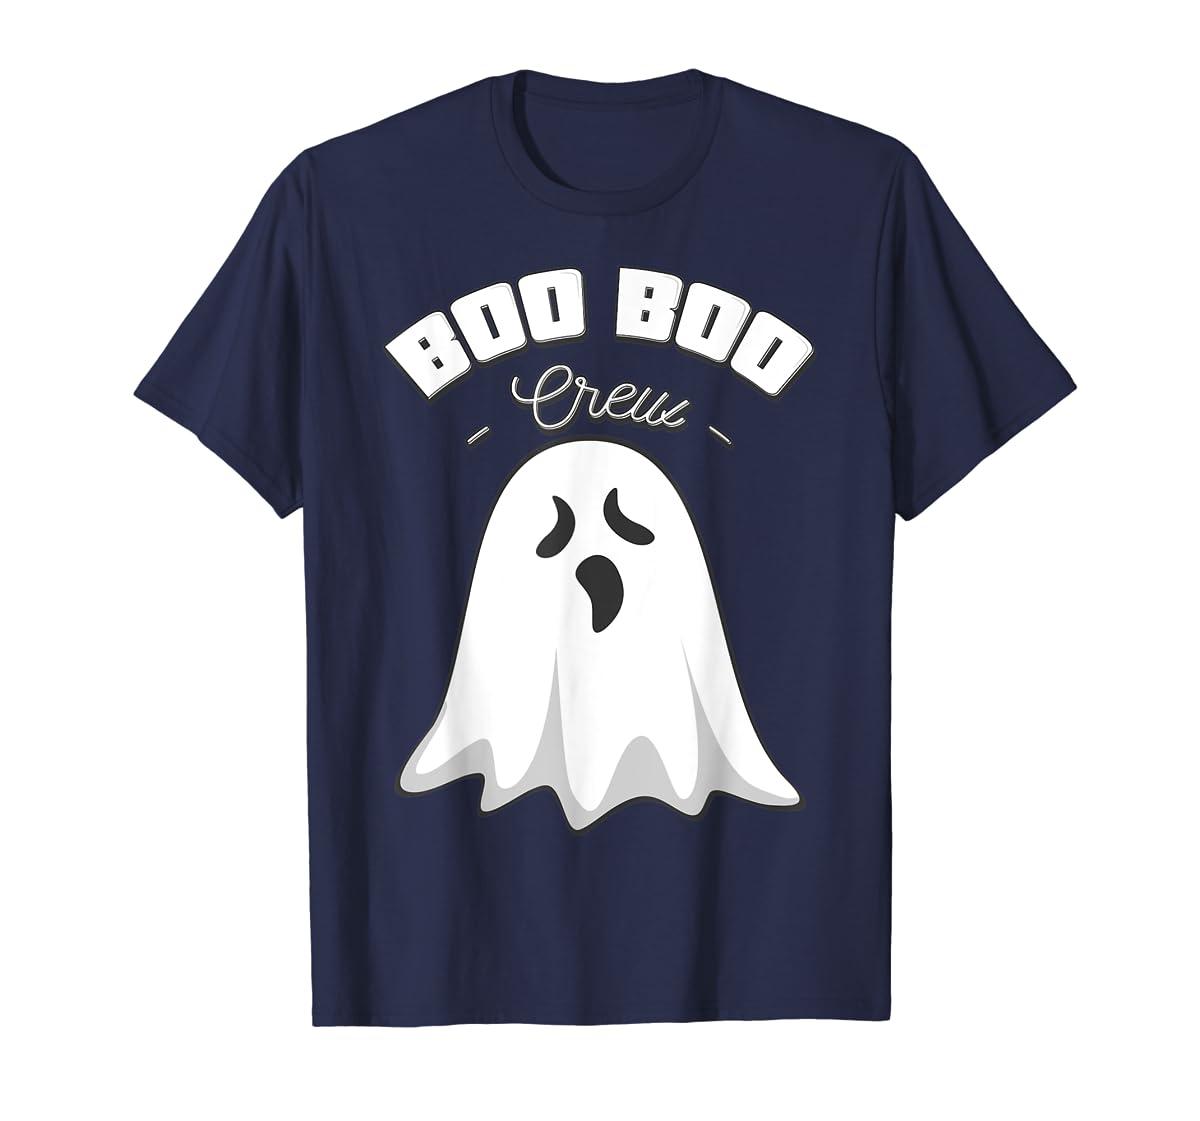 Boo Boo Crew Ghost Funny Halloween Black and Orange Night  T-Shirt-Men's T-Shirt-Navy